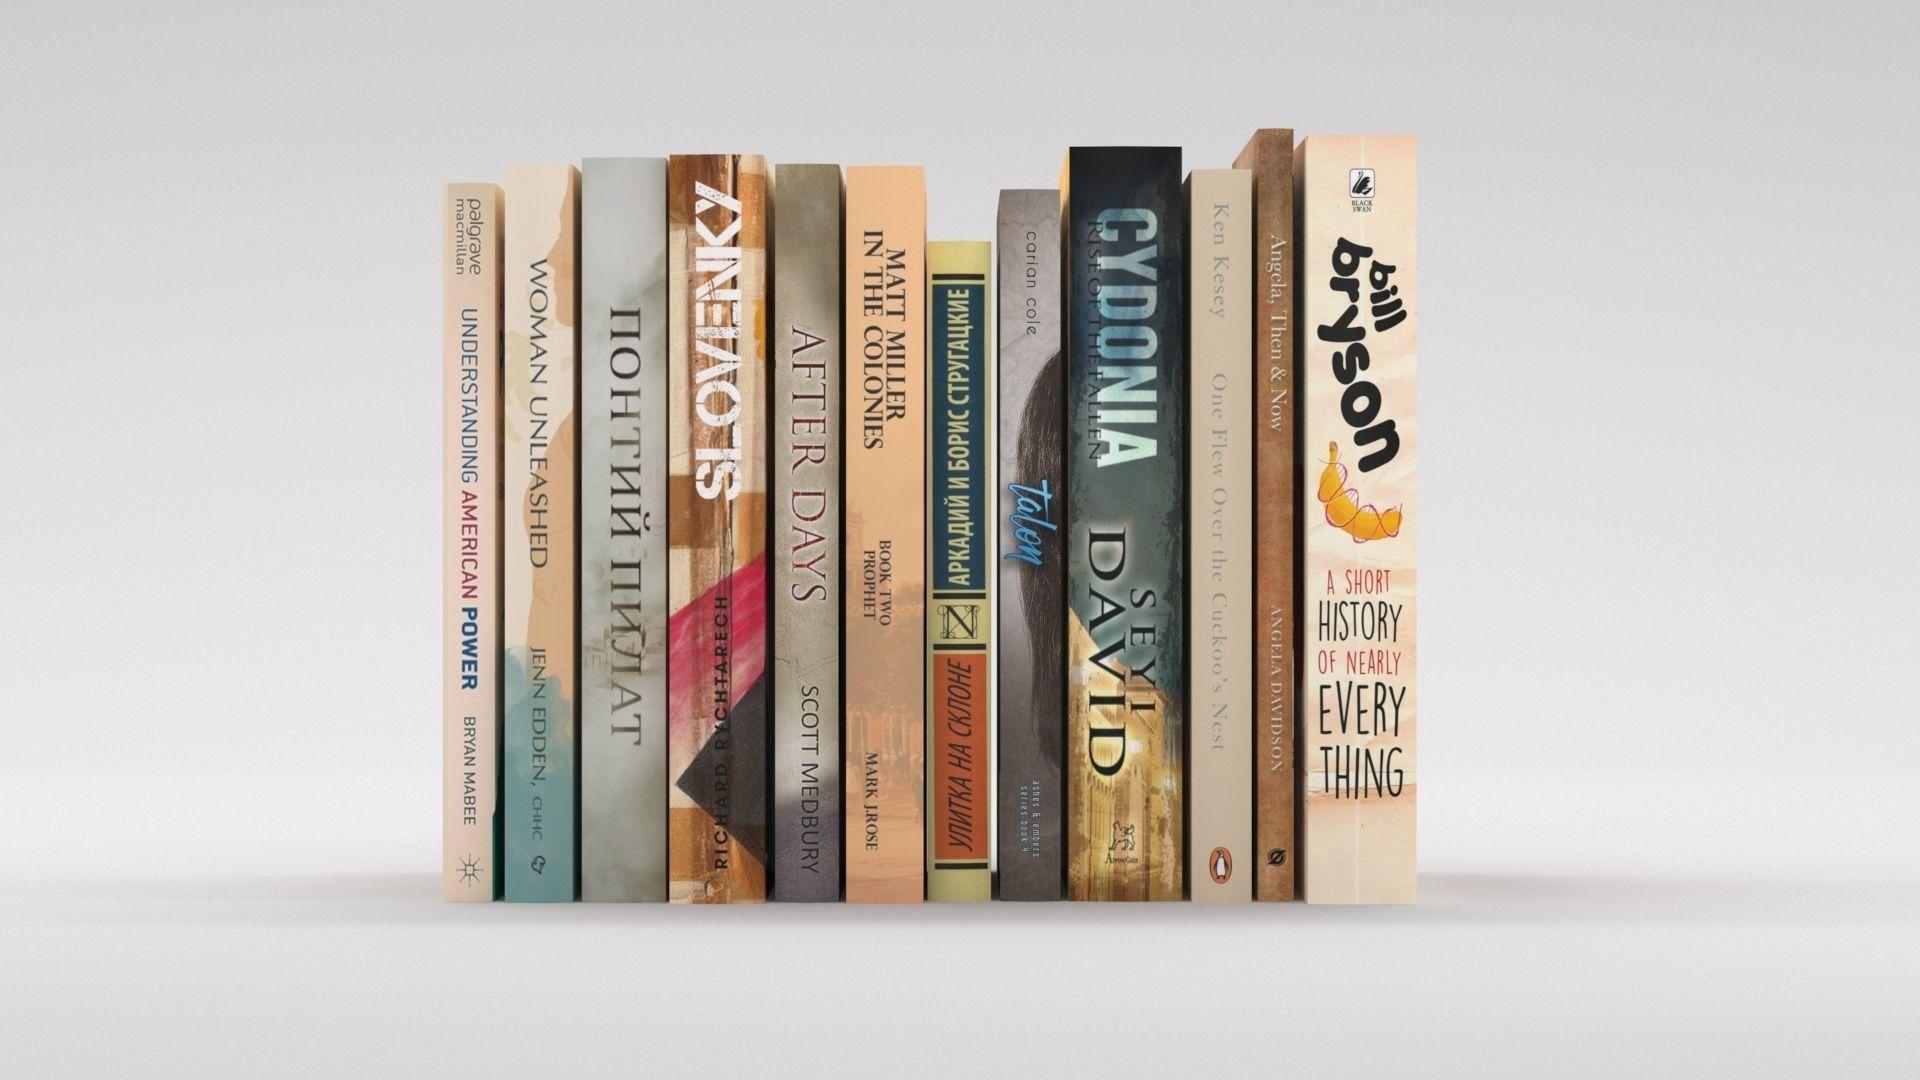 12 hardcover beige books